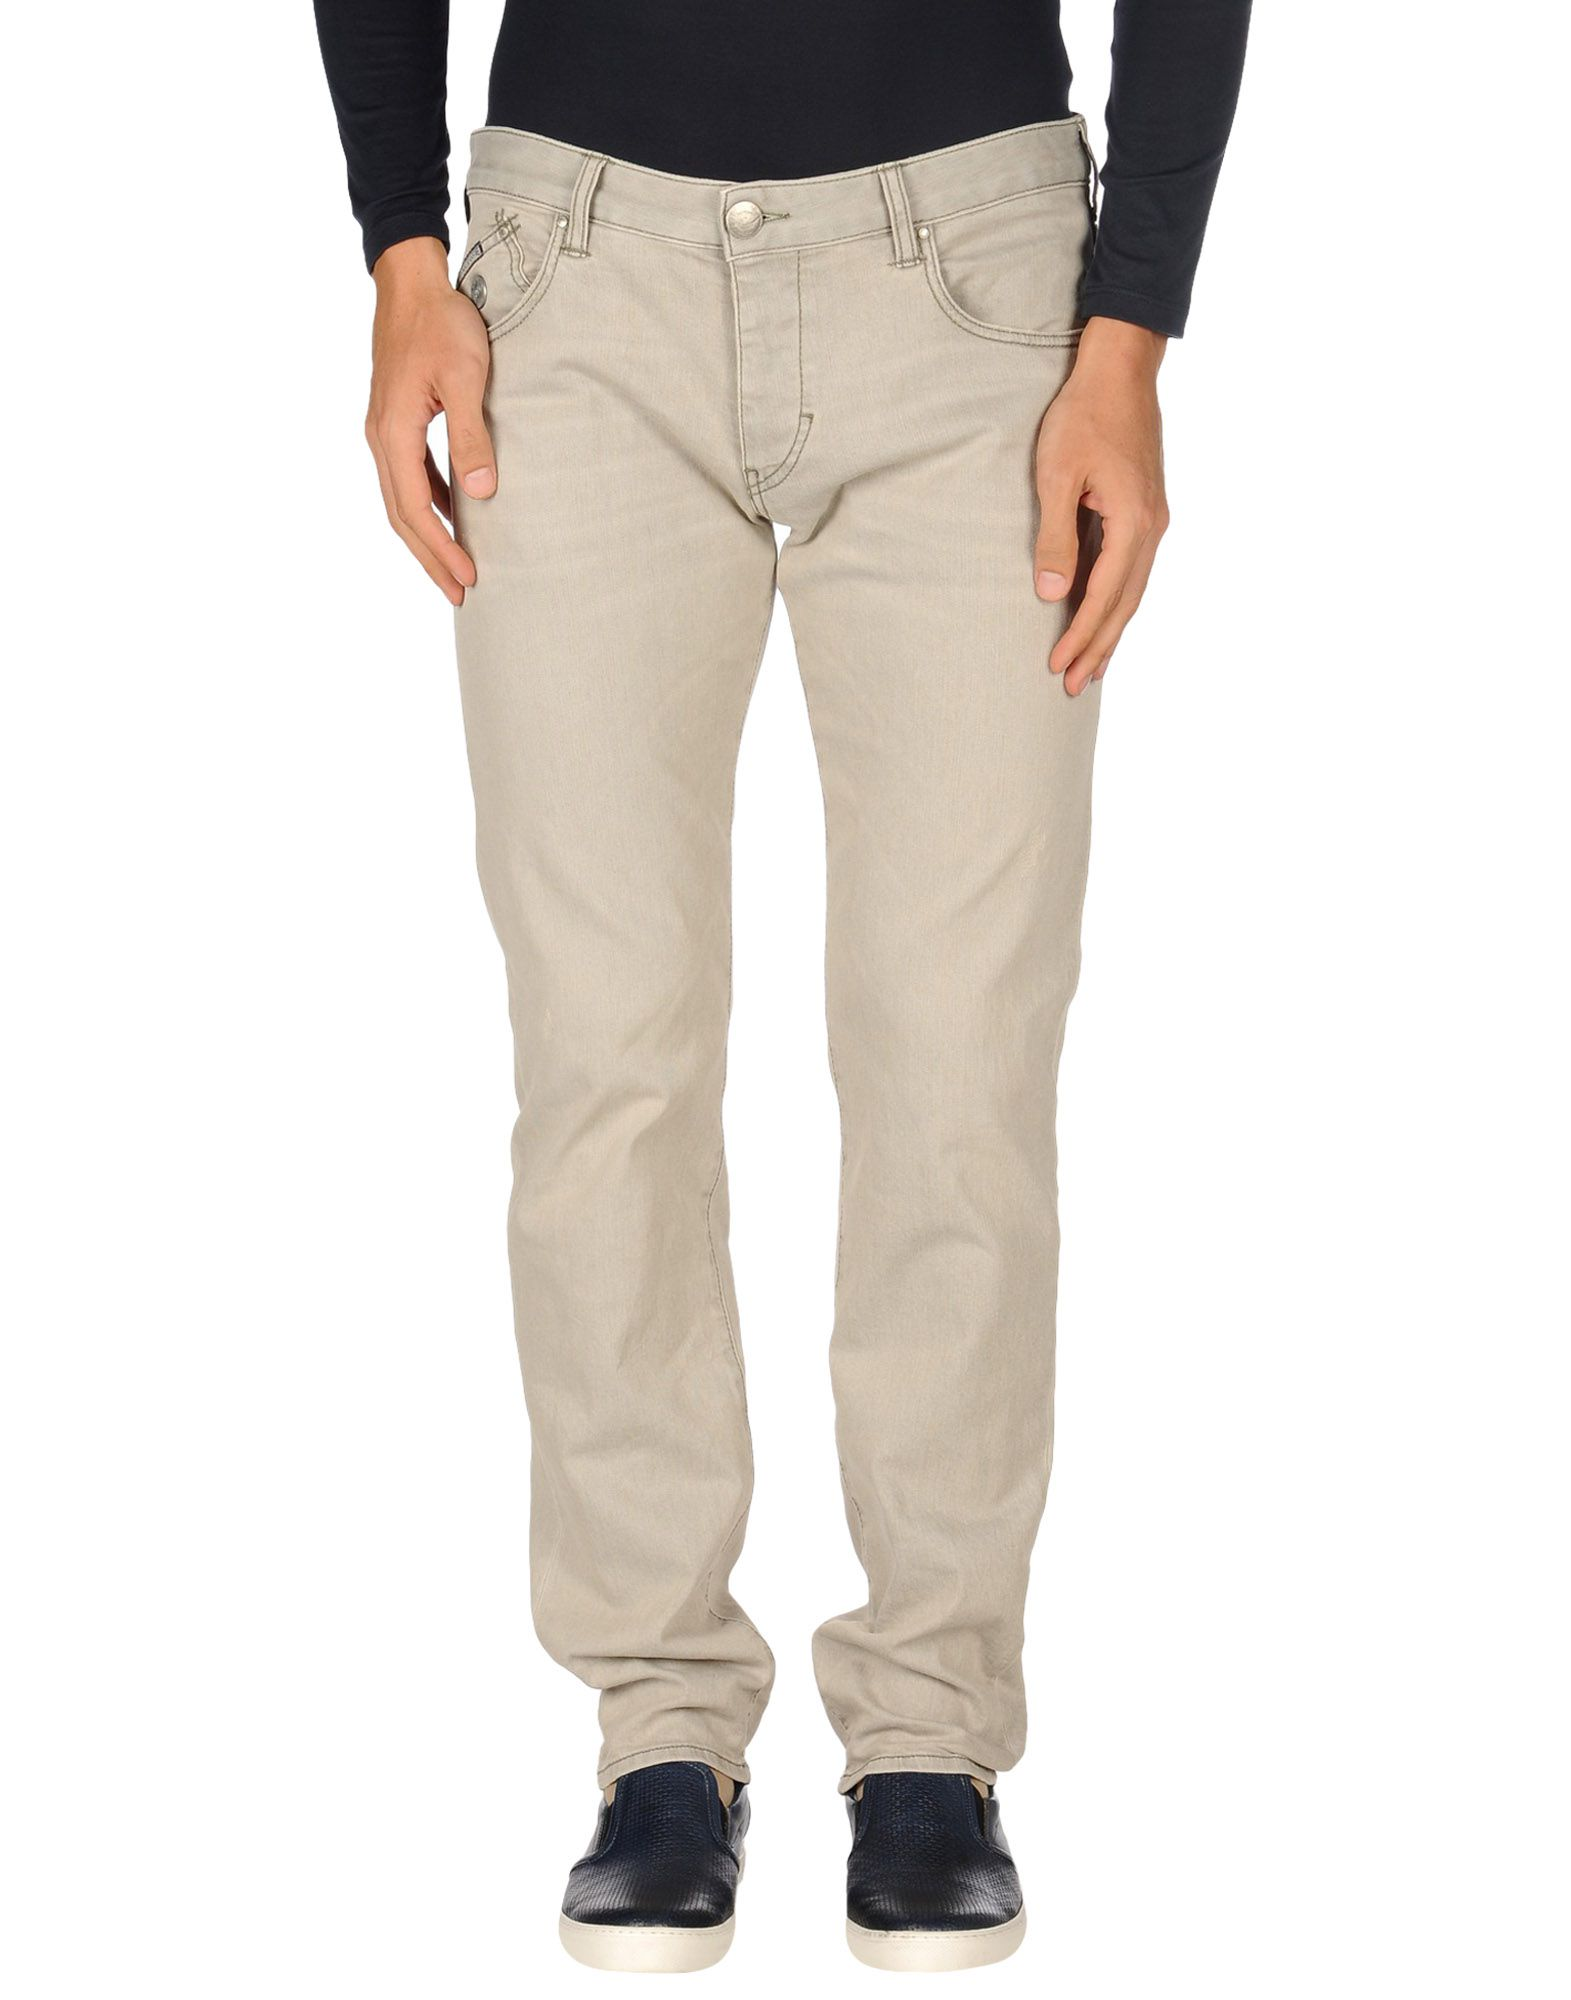 ФОТО armani jeans джинсовые брюки